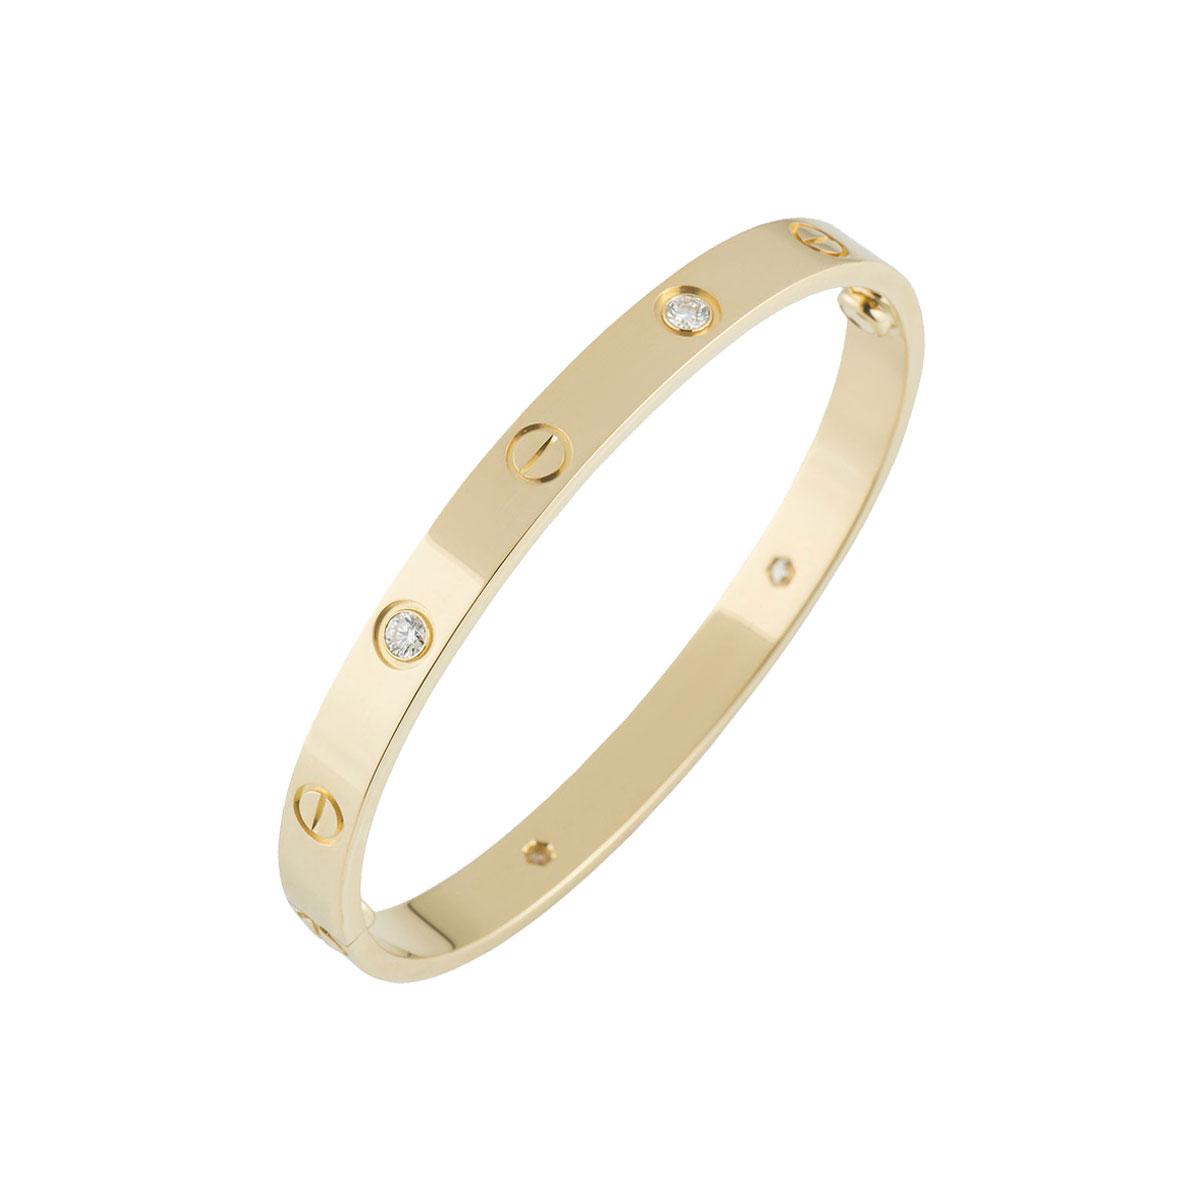 4953a11d02796 Cartier Love Bracelet